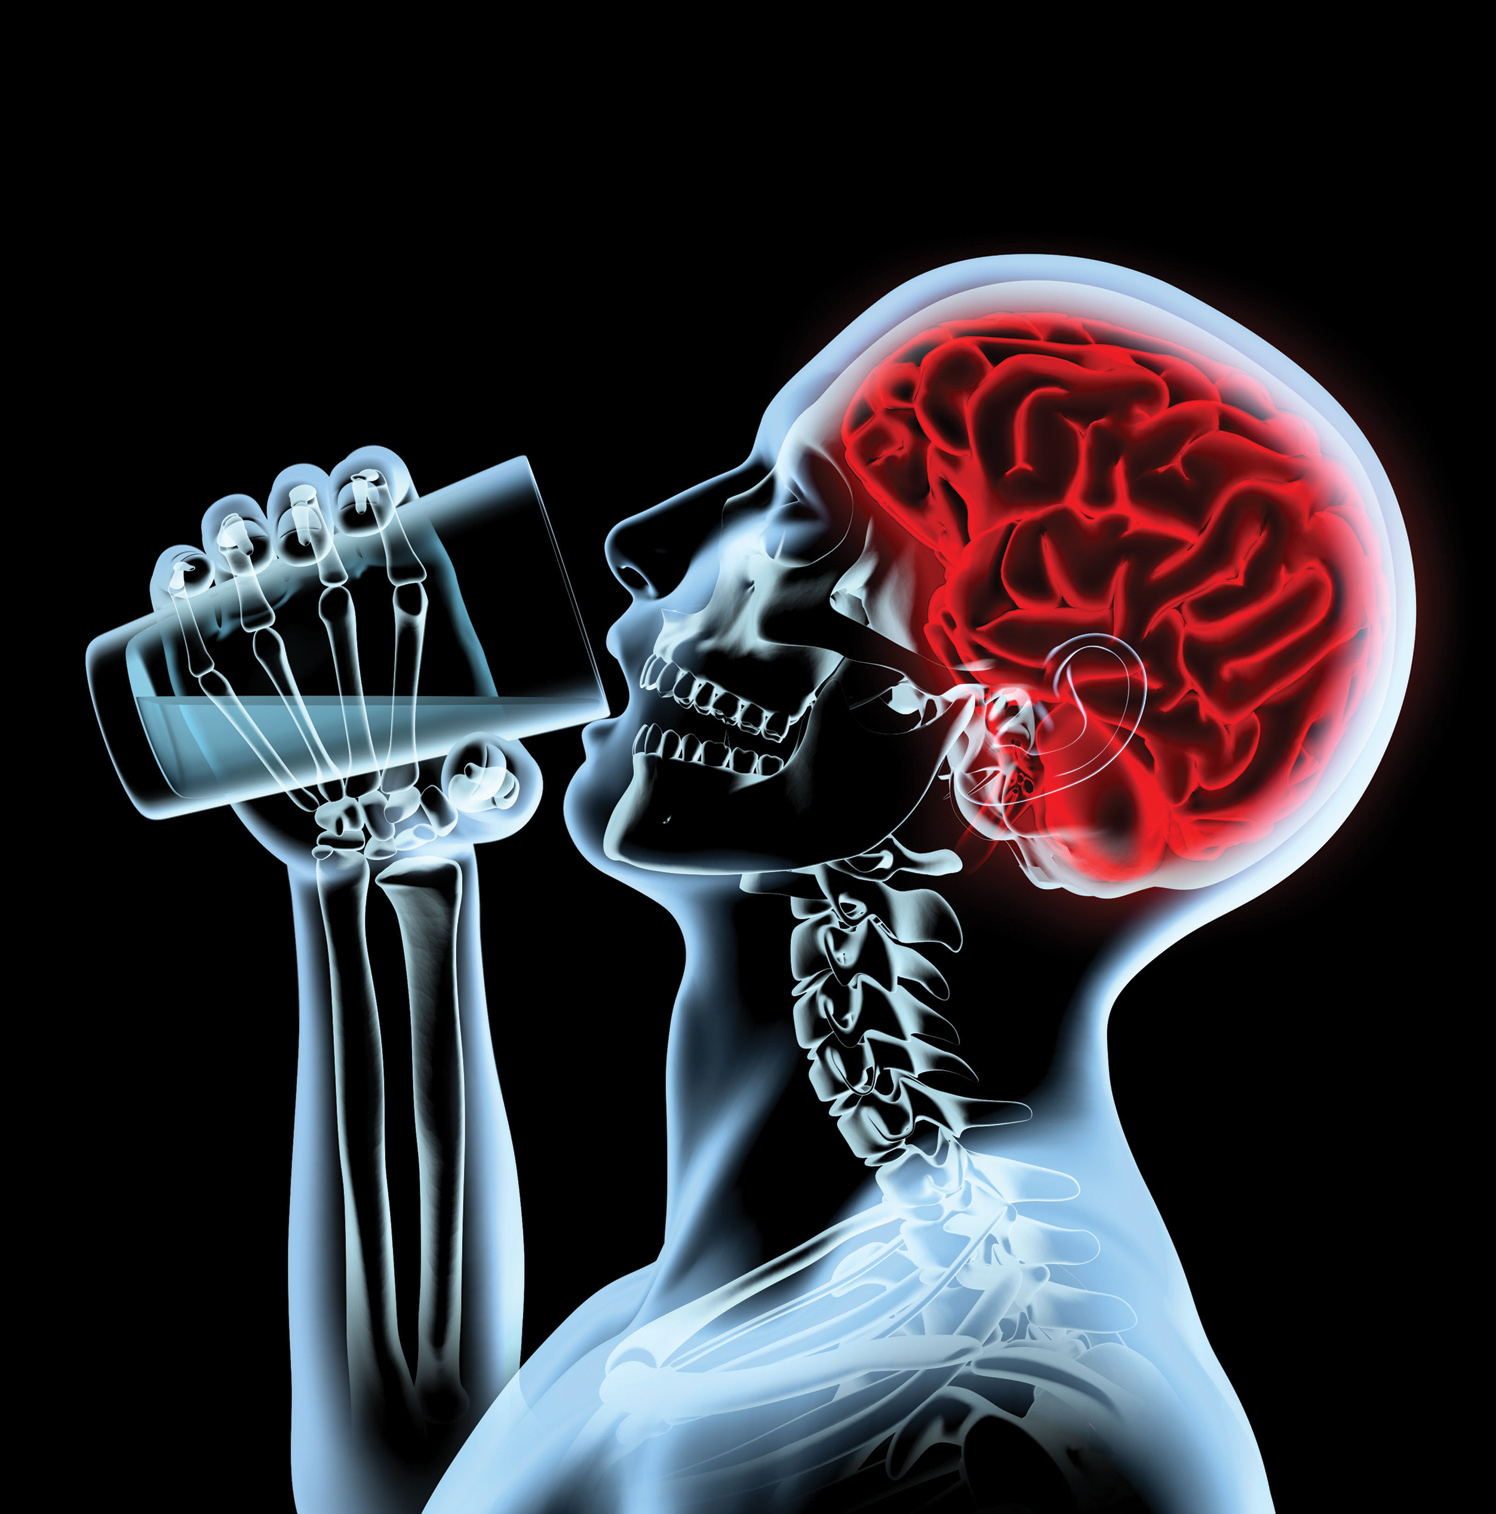 X - ray brain